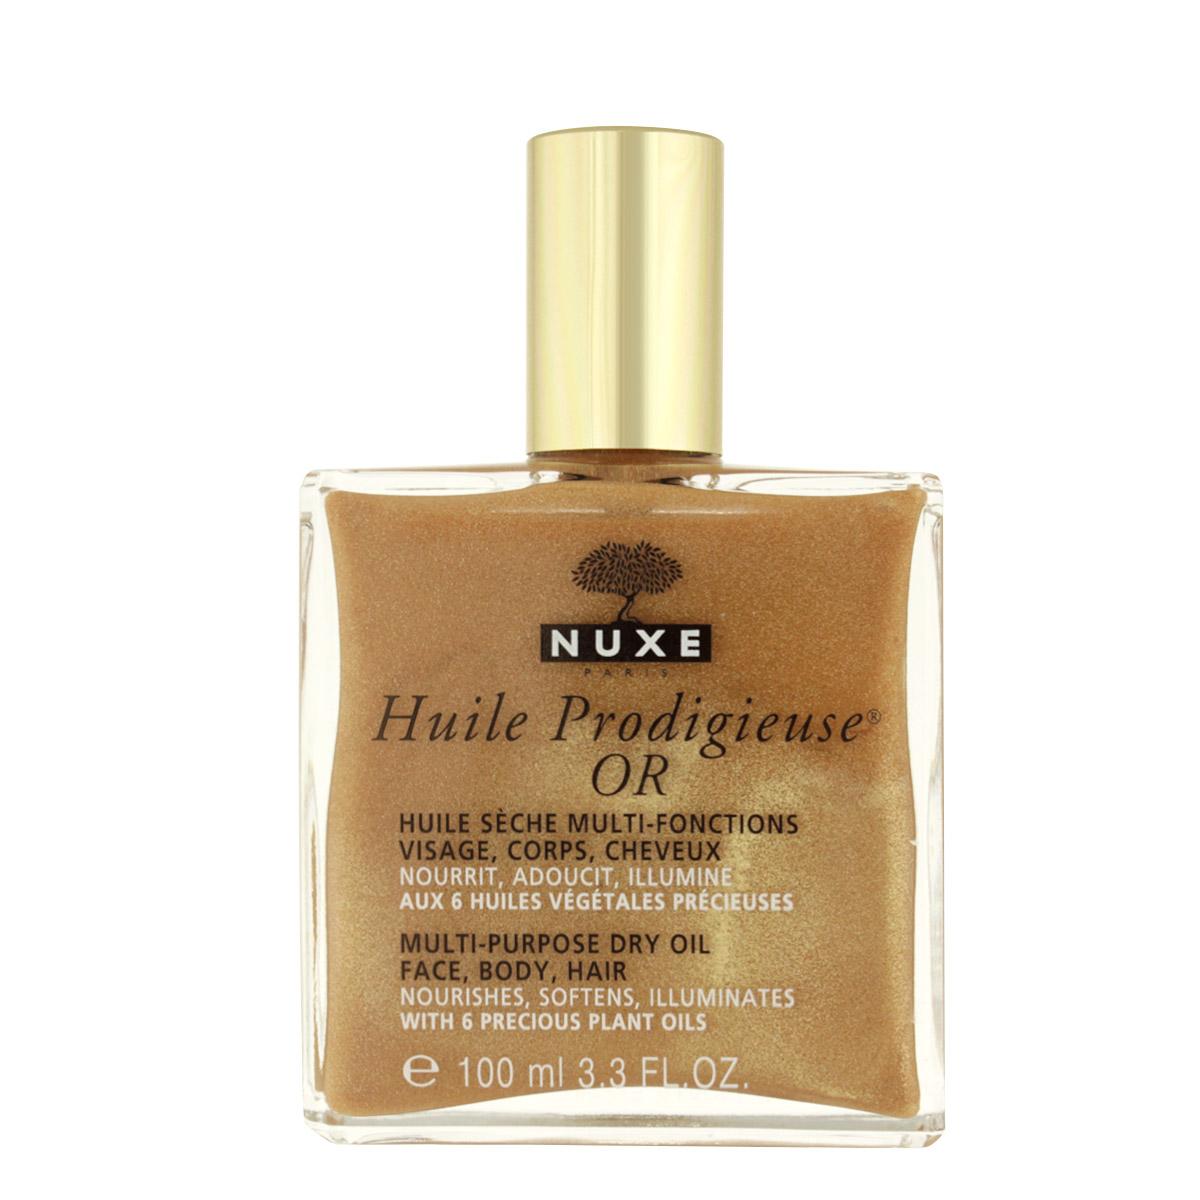 Nuxe Paris Huile Prodigieuse OR Multi-Purpose Dry Oil 100 ml